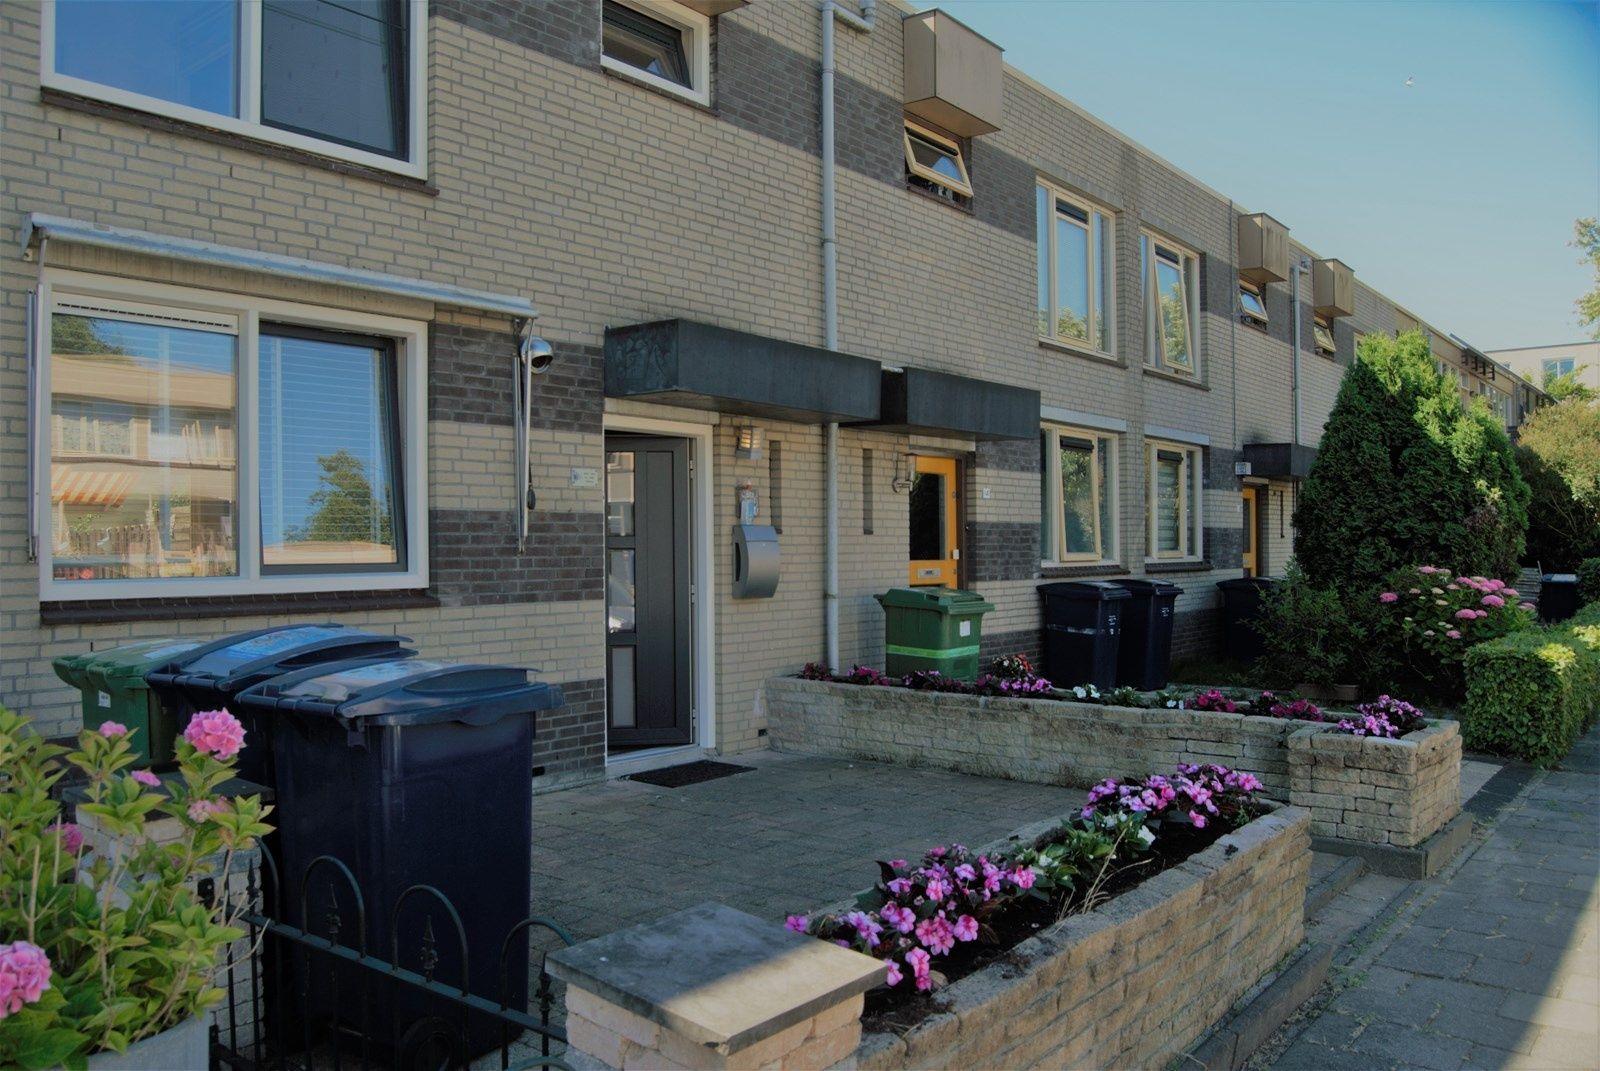 Rachmaninovstraat 16, Almere